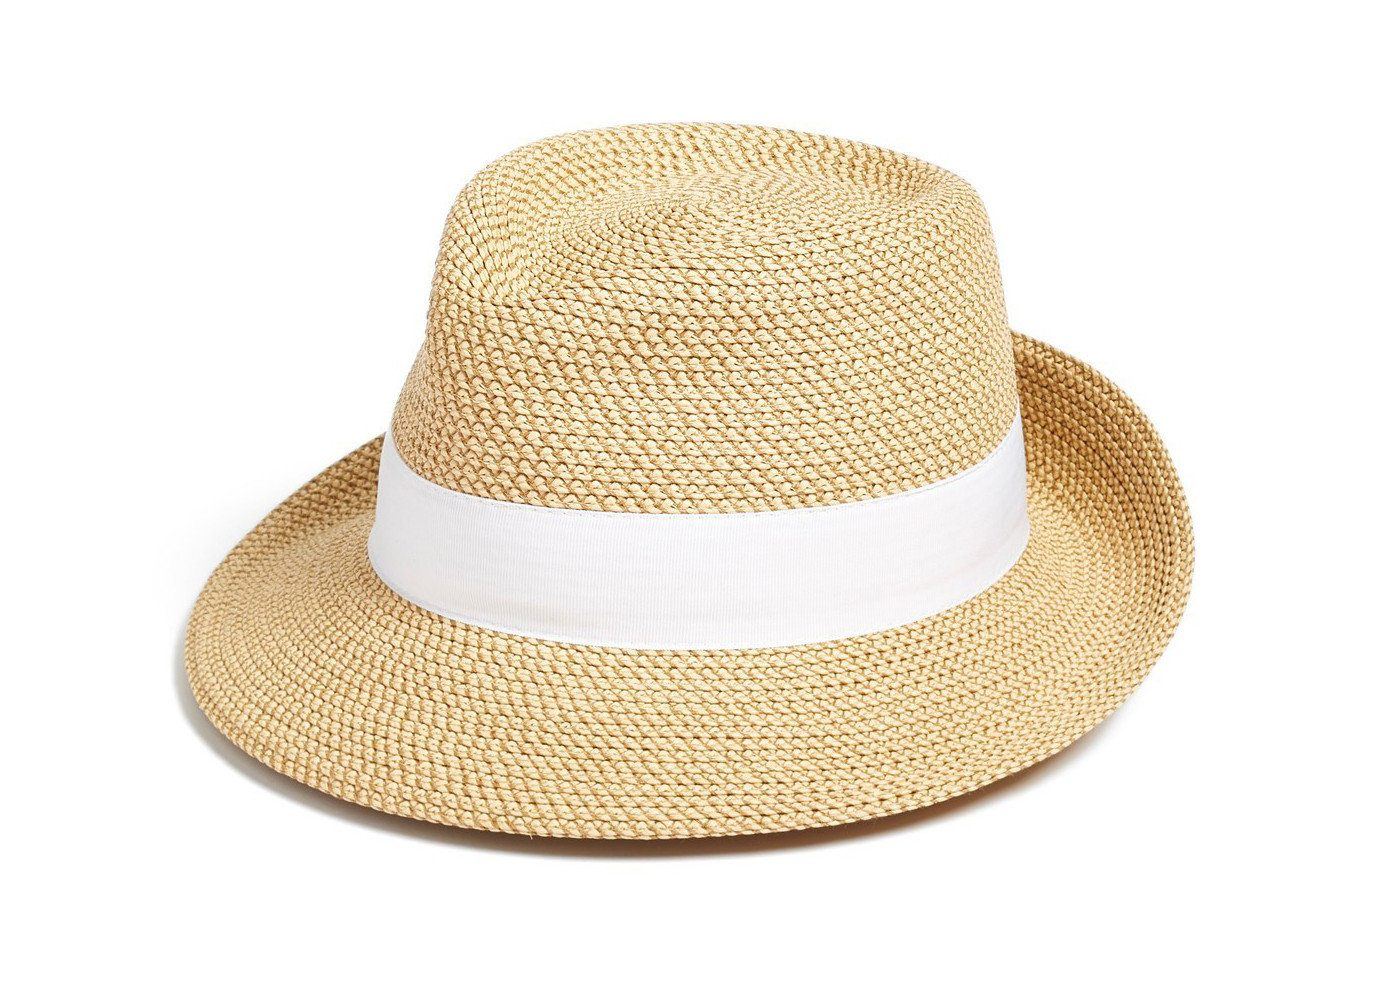 Trip Ideas clothing hat headdress headgear sun hat product fedora product design